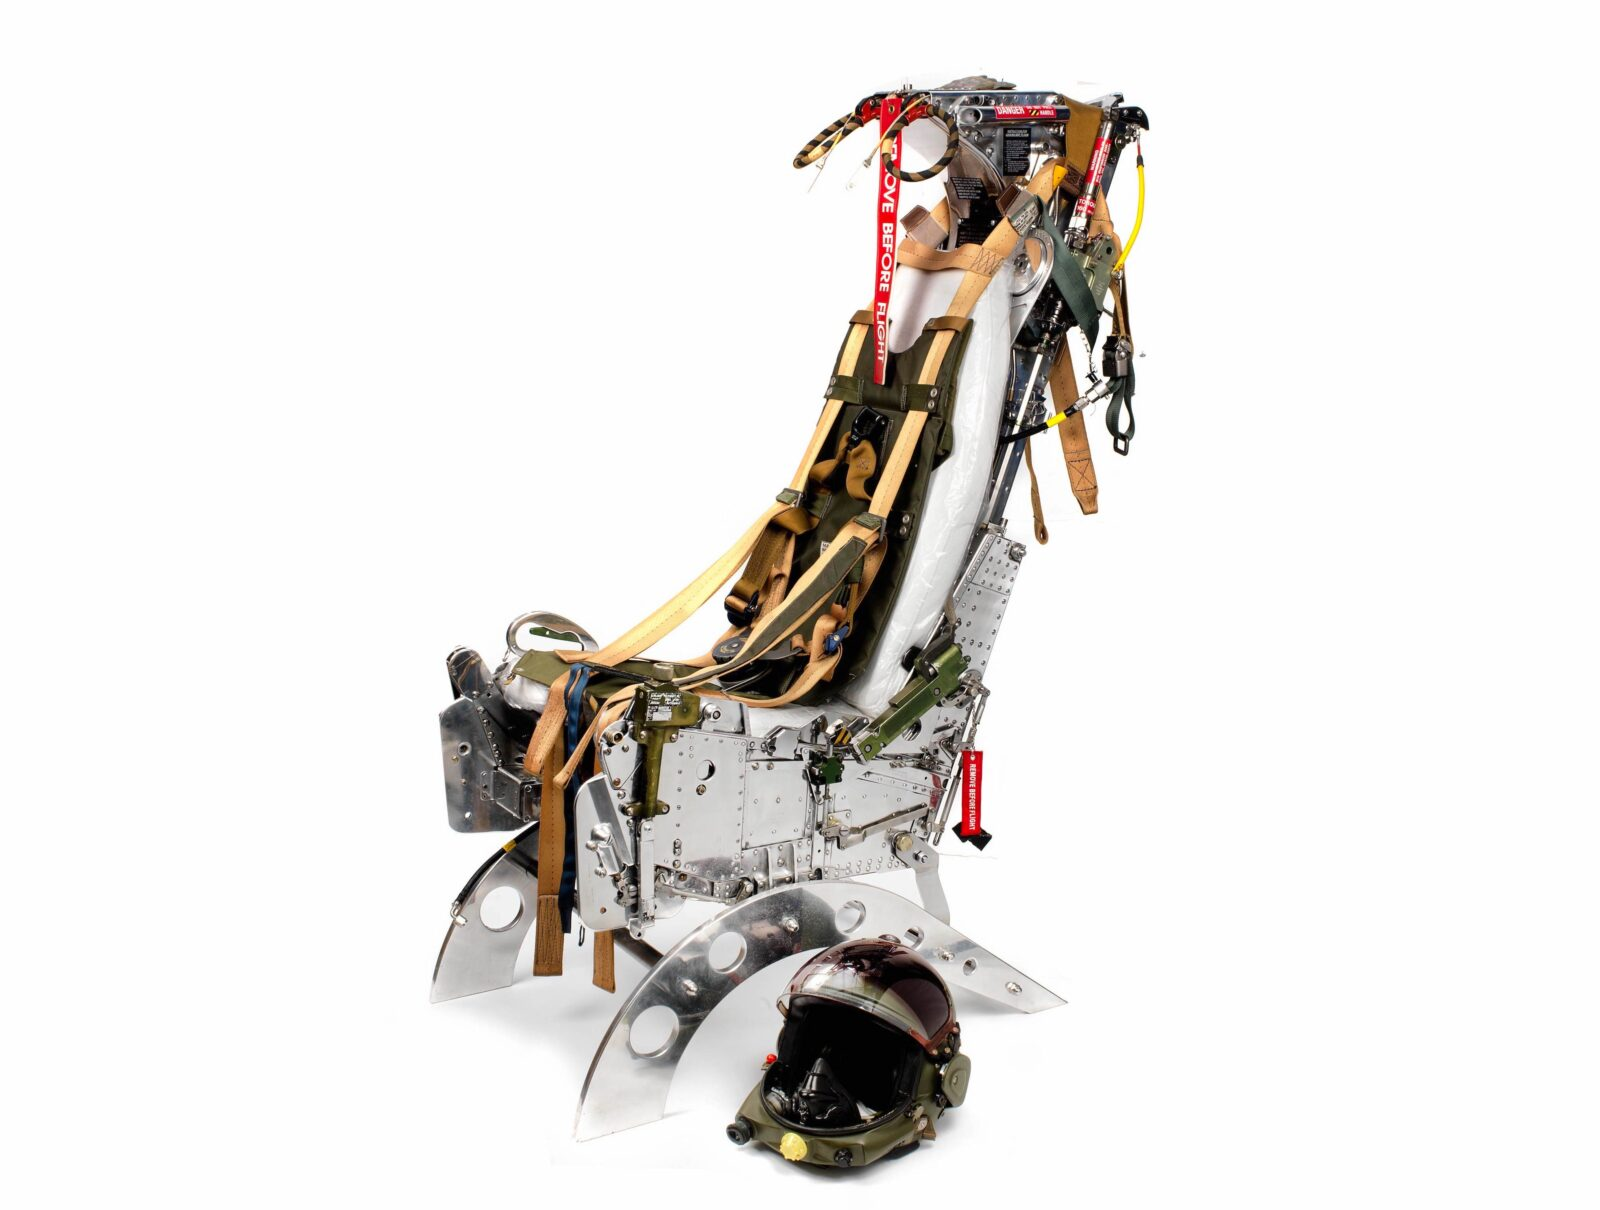 Martin-Baker Mk 7 Ejector Seat